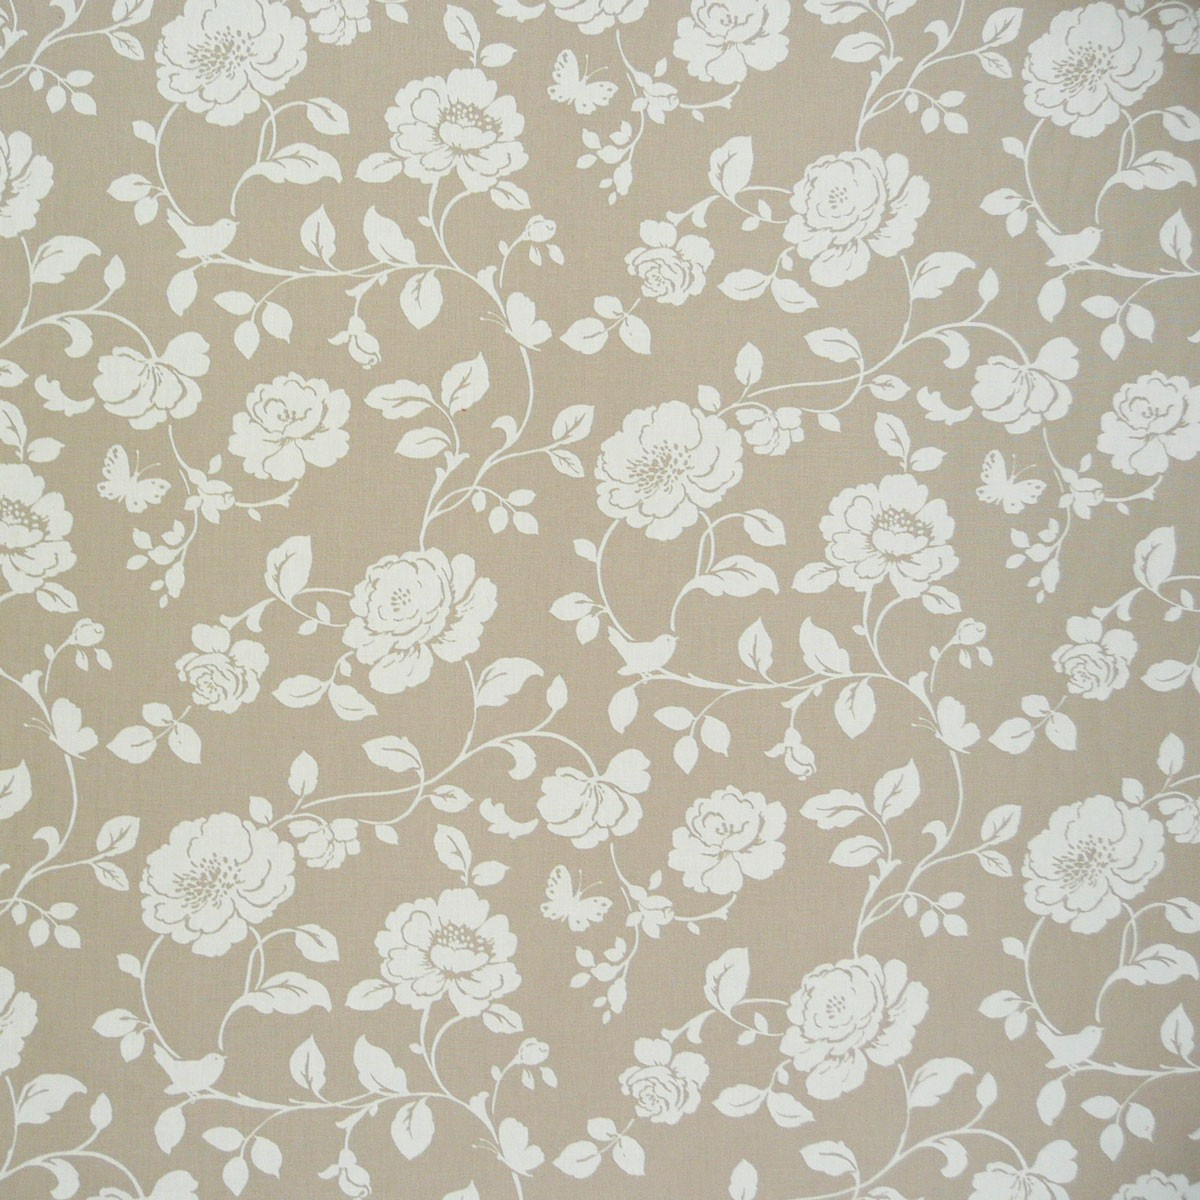 baumwollstoff stoff rose hellbraun wei stoffe stoffe gemustert stoff blumen. Black Bedroom Furniture Sets. Home Design Ideas